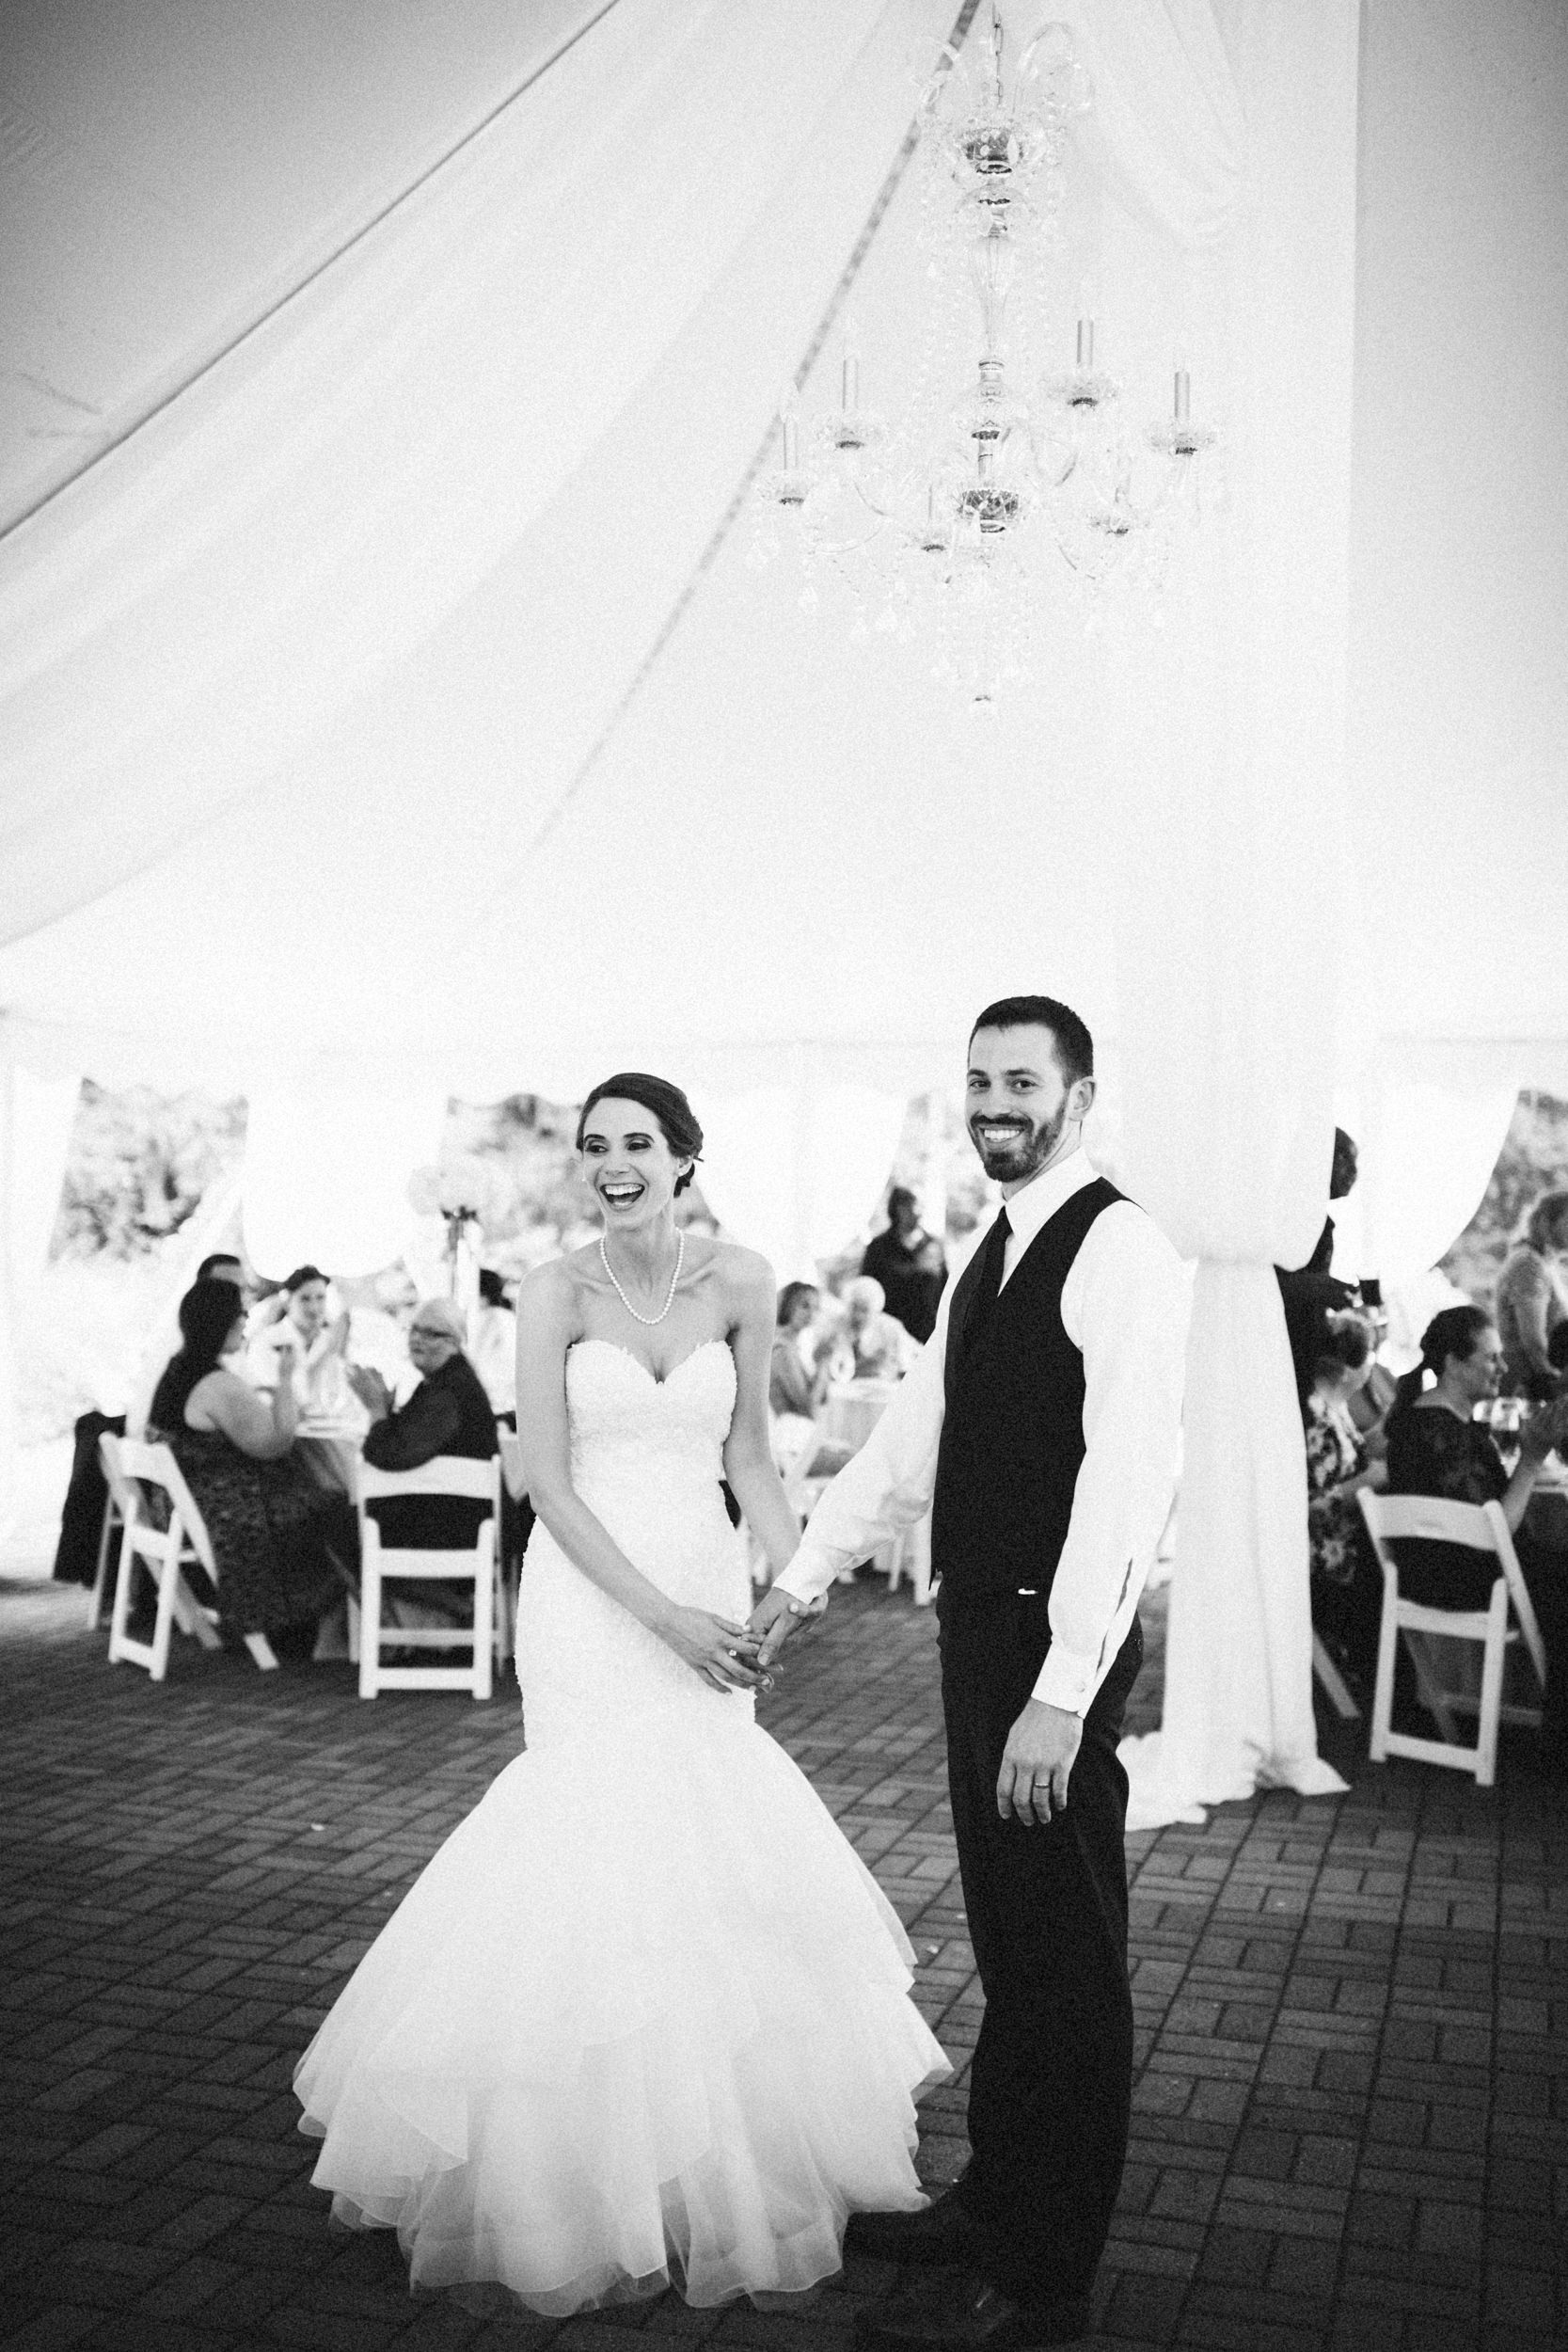 Louisville-Kentucky-Wedding-Elopement-Photographer-Sarah-Katherine-Davis-Photography-Whitehall-Classic-Timeless-Garden-Wedding-660.jpg